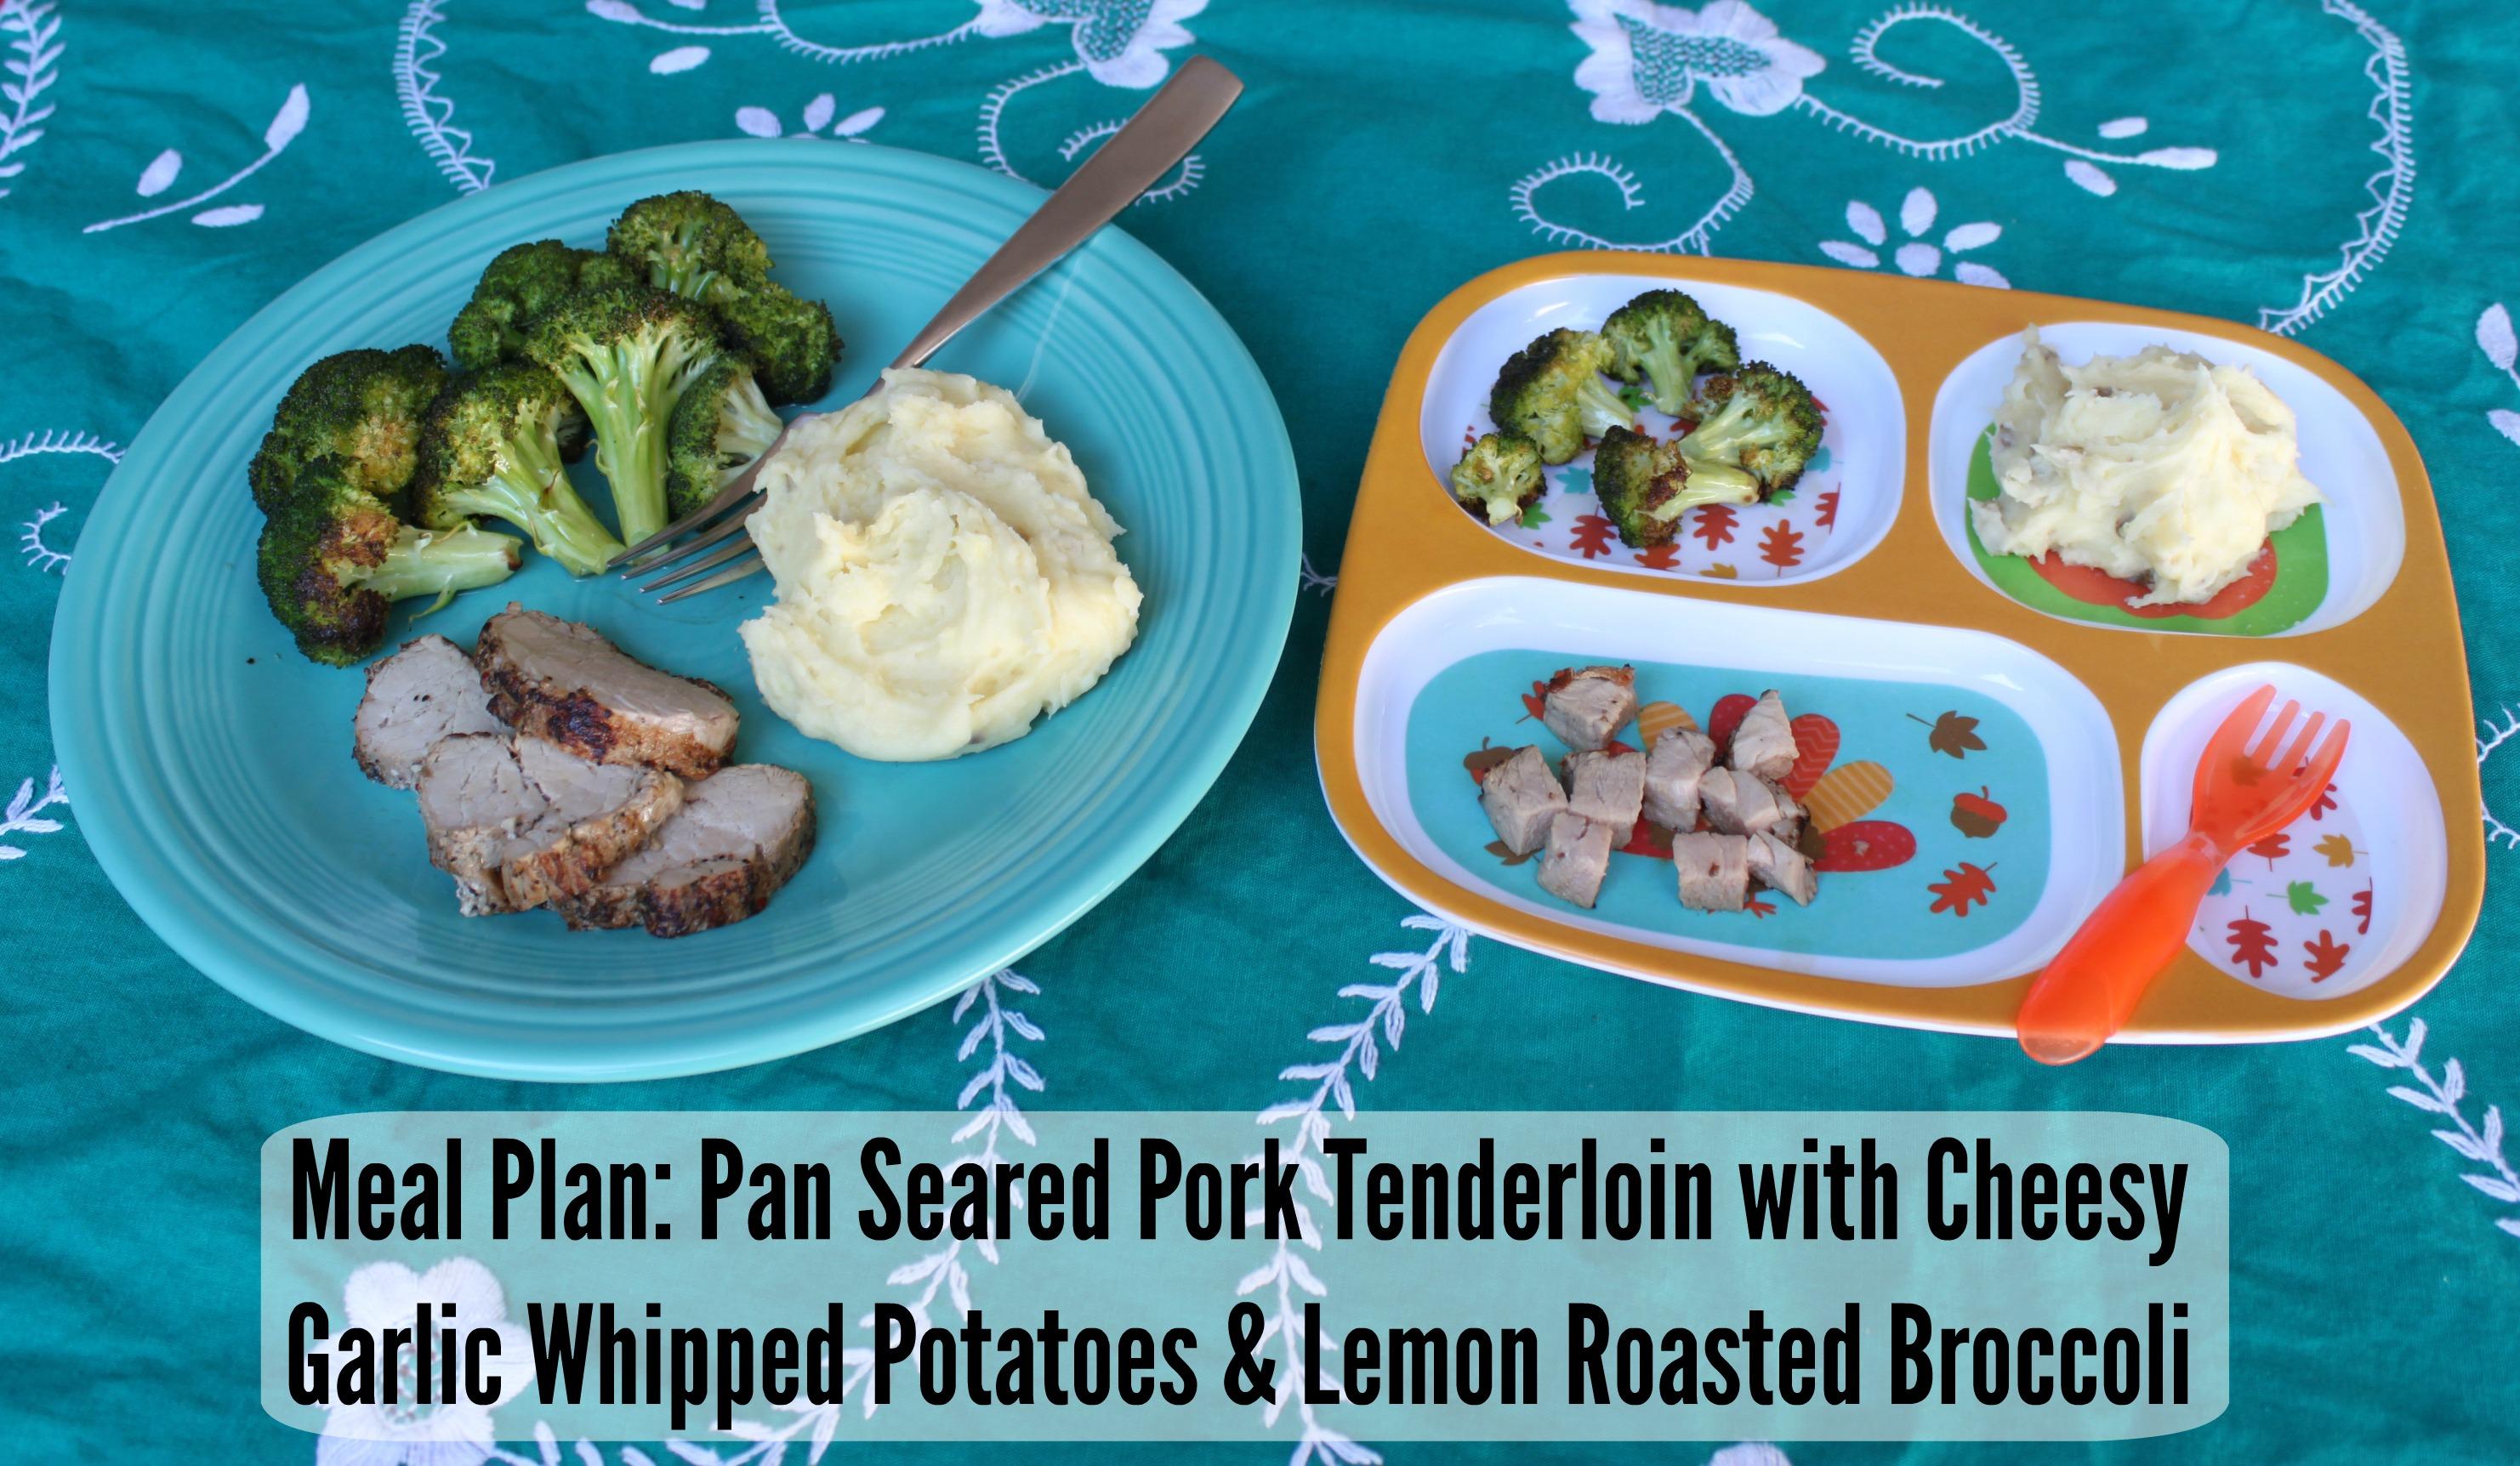 Meal Plan: Pan Seared Pork Tenderloin with Cheesy Garlic Whipped ...